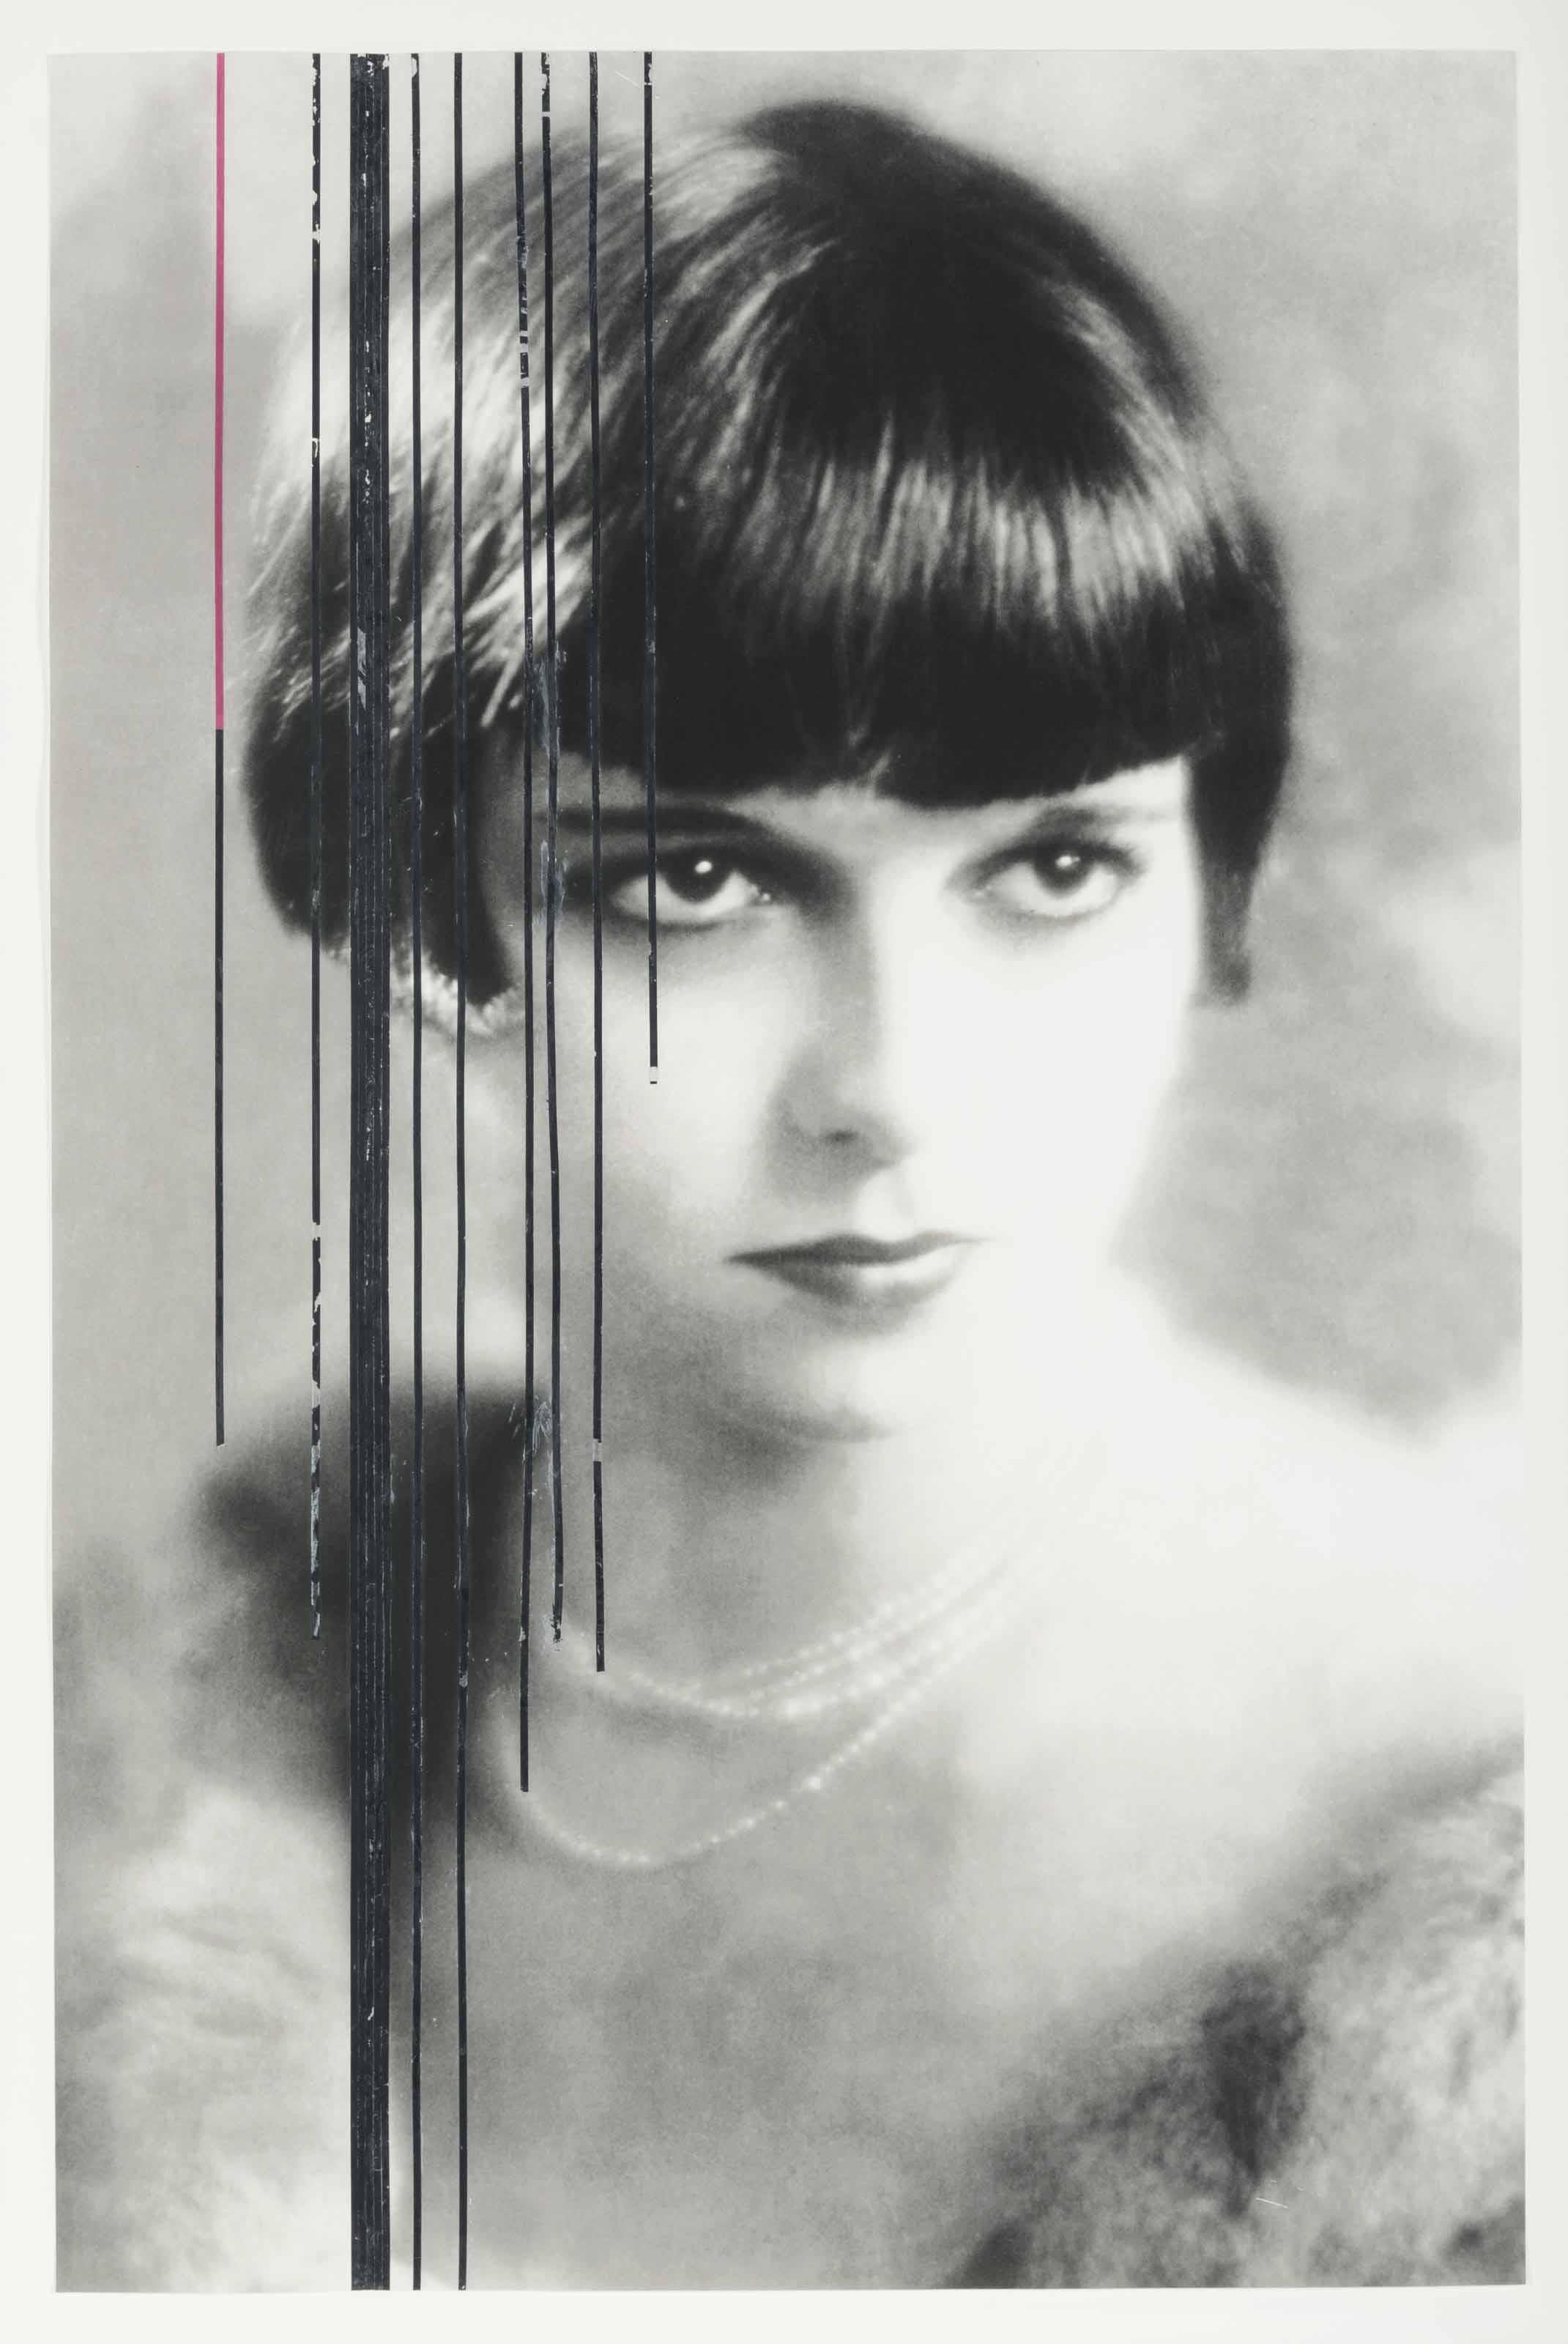 L.B. Blume (Japanese Version E.N.)